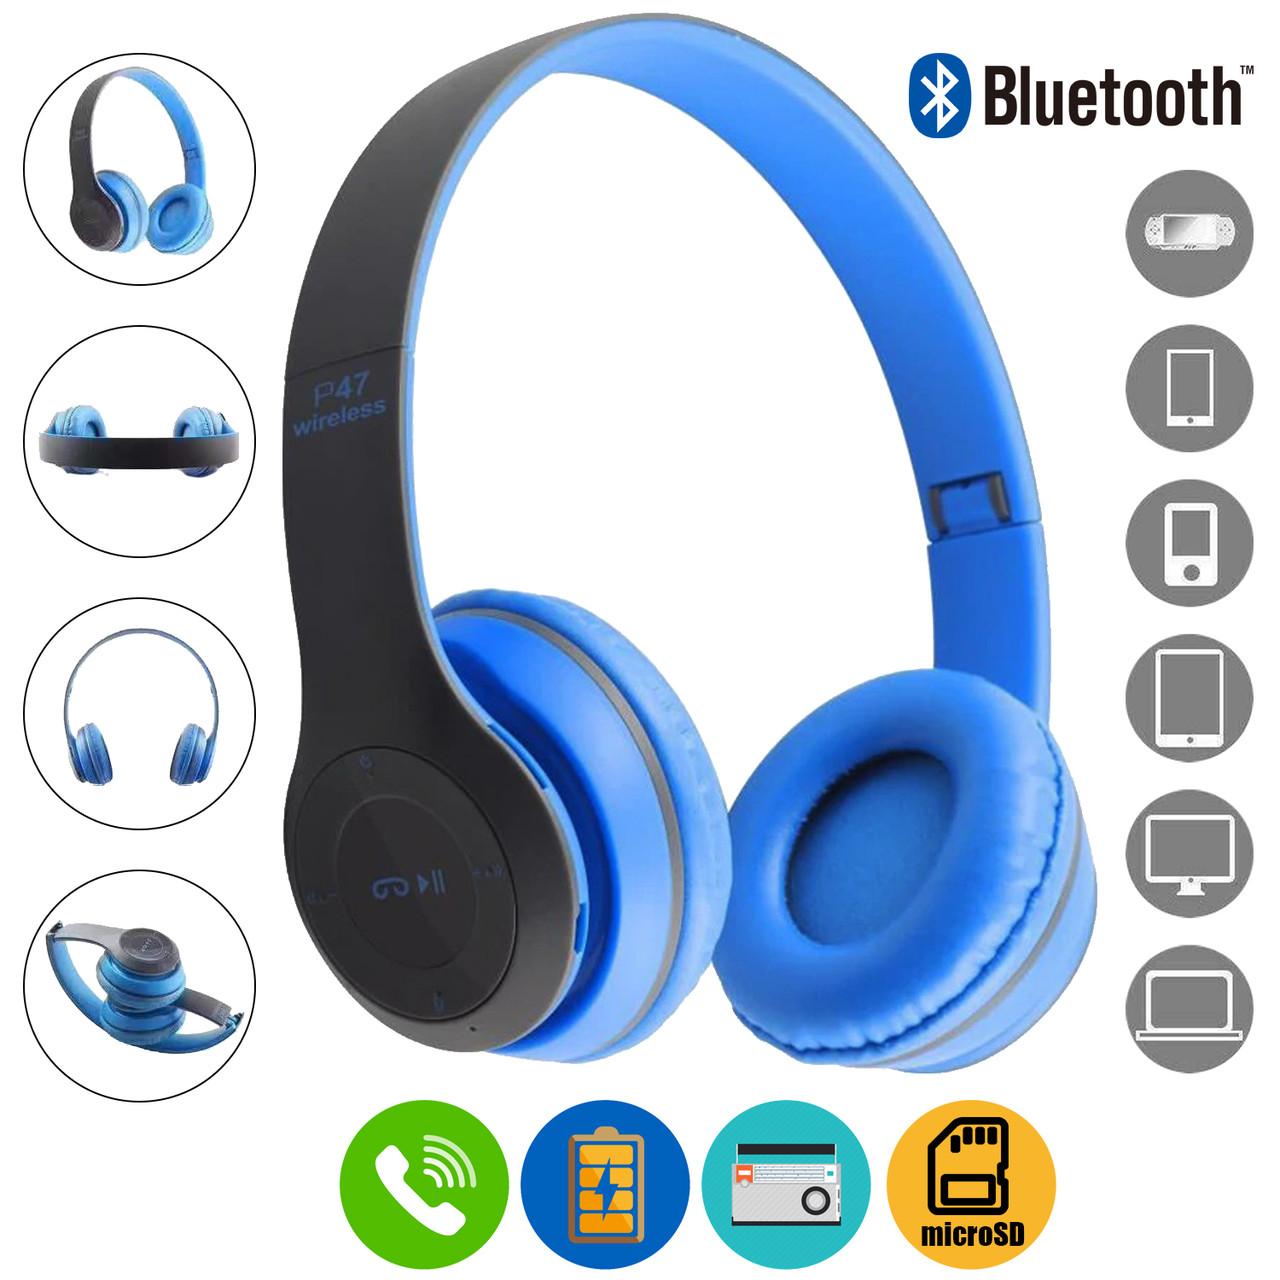 Бездротові Bluetooth-навушники Wireless Headset P47 Blue